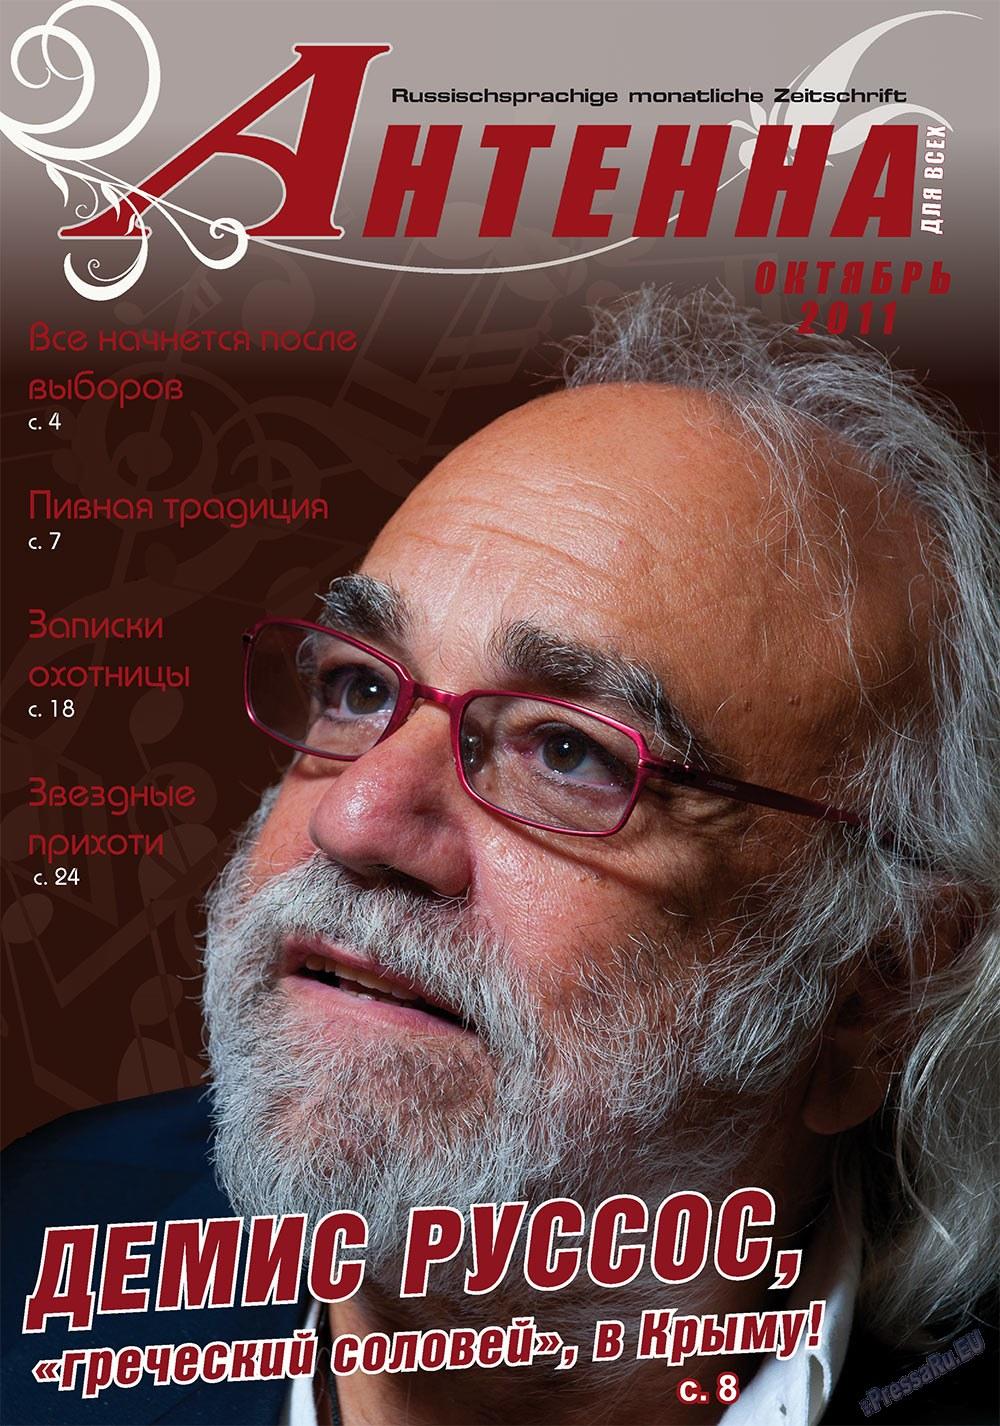 Антенна (журнал). 2011 год, номер 10, стр. 1